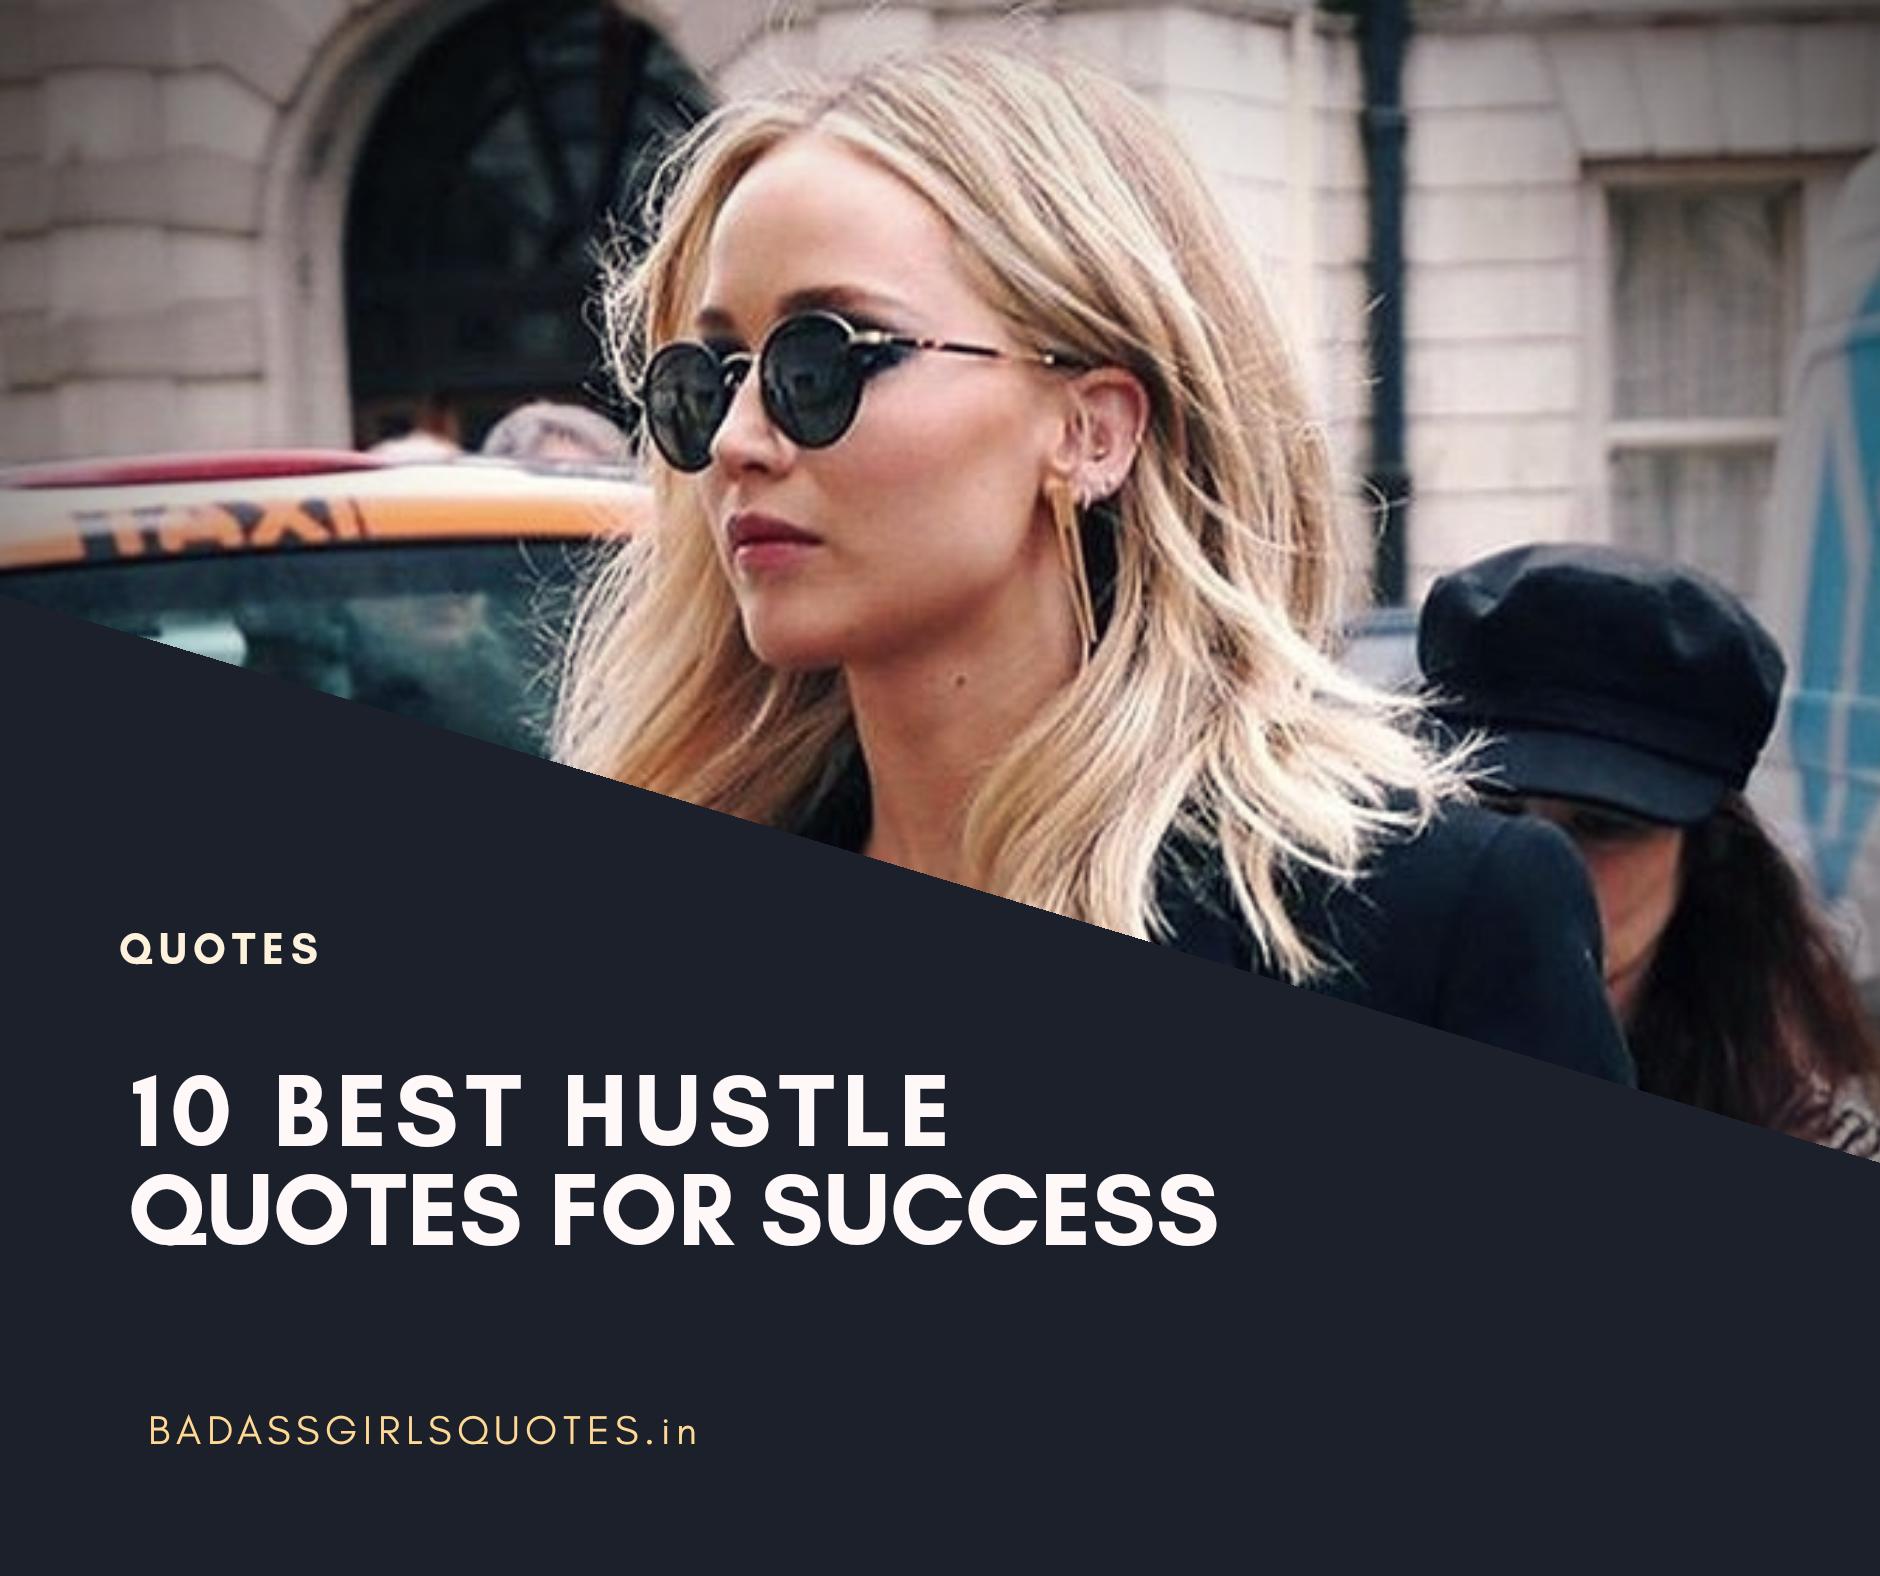 Quotes,Motivational quotes, Badass quotes, BadassGirlsQuotes, Quotes for girls, Girly Quotes, success quotes, Best Quotes, Girly Quote, Hustle